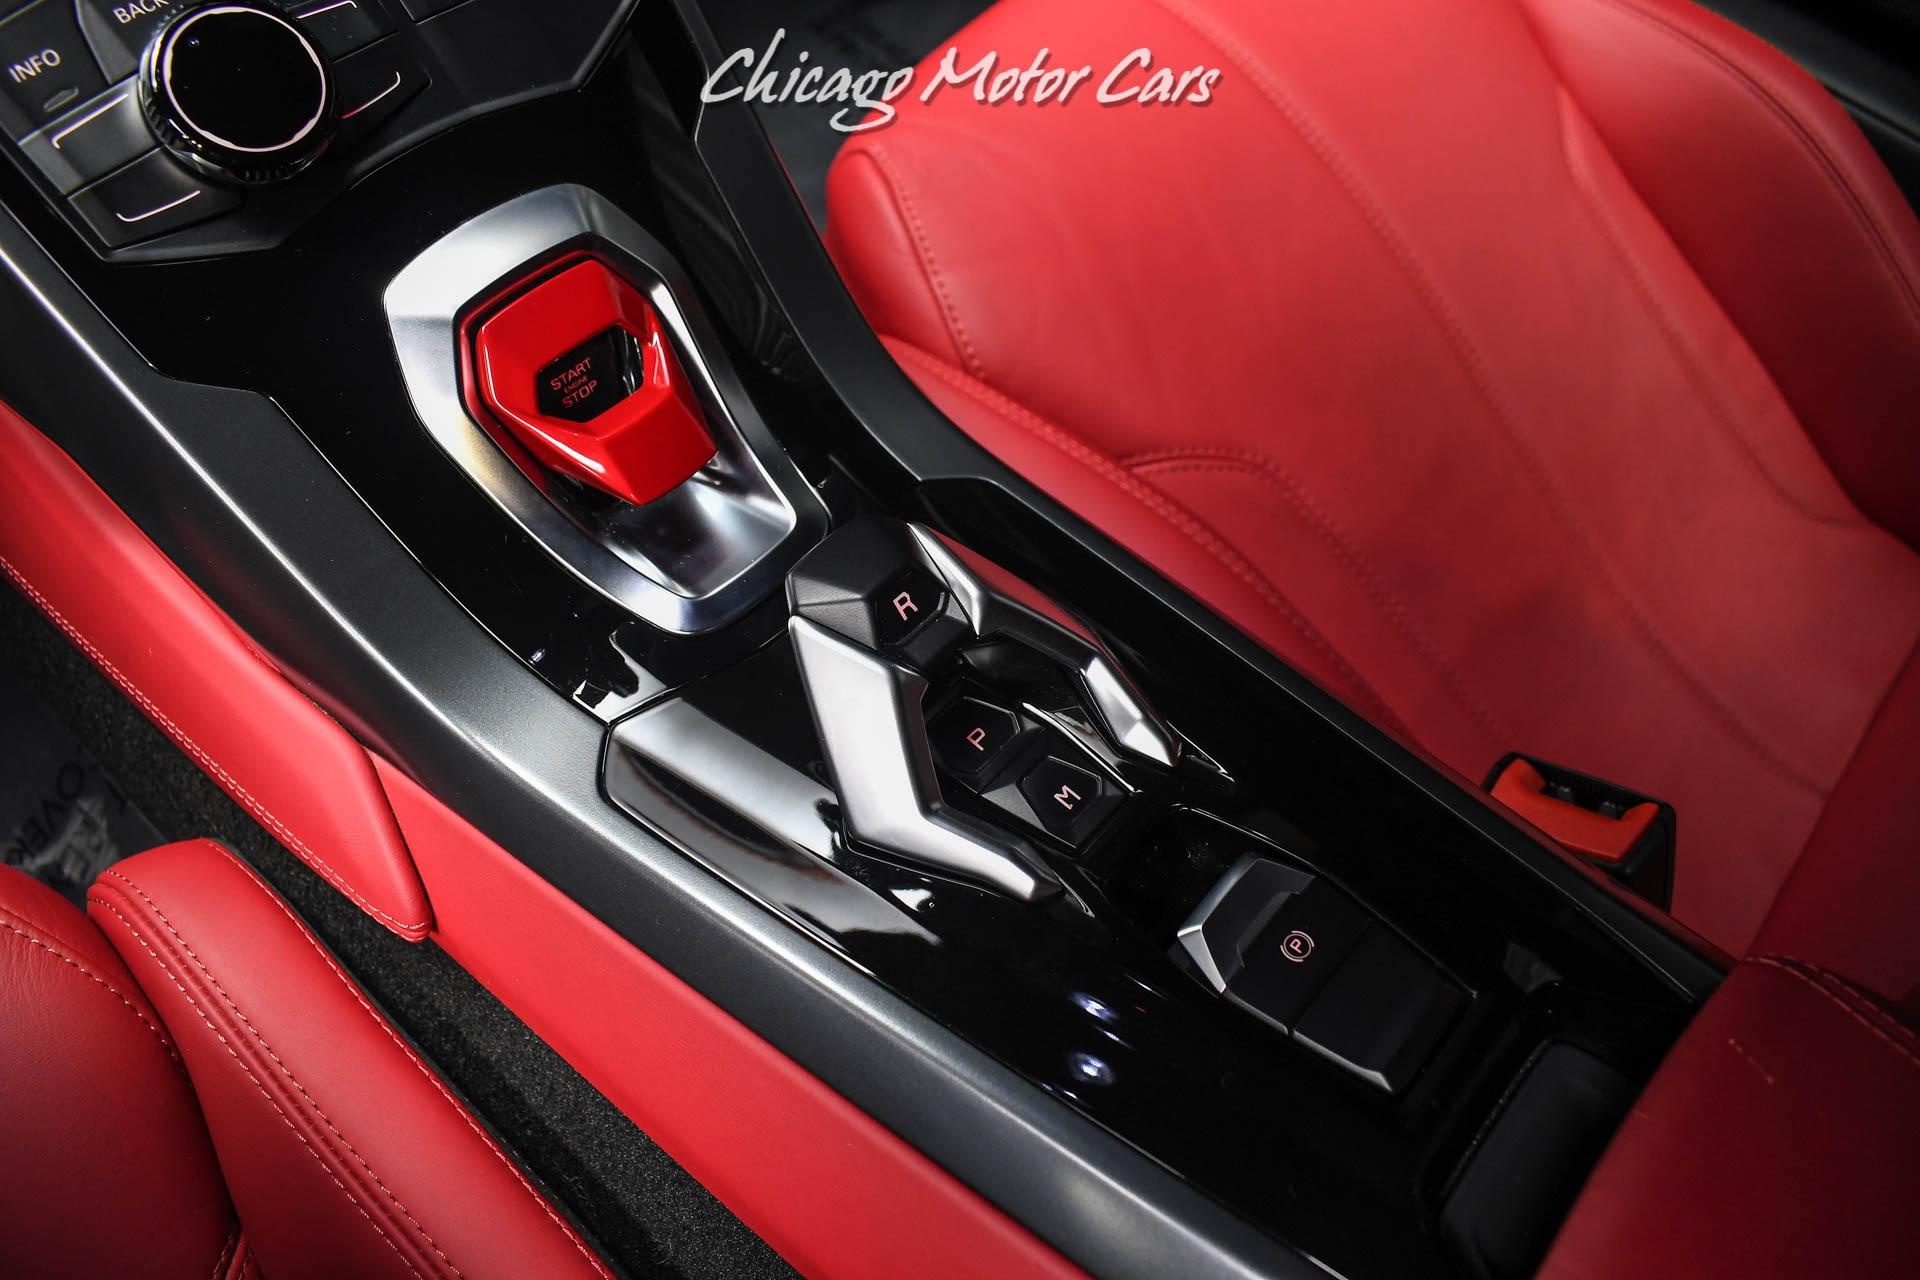 Used-2015-Lamborghini-Huracan-LP-610-4-Coupe-Twin-Turbo-Carbon-Fiber-ANRKY-Wheels-Hot-Color-Combo